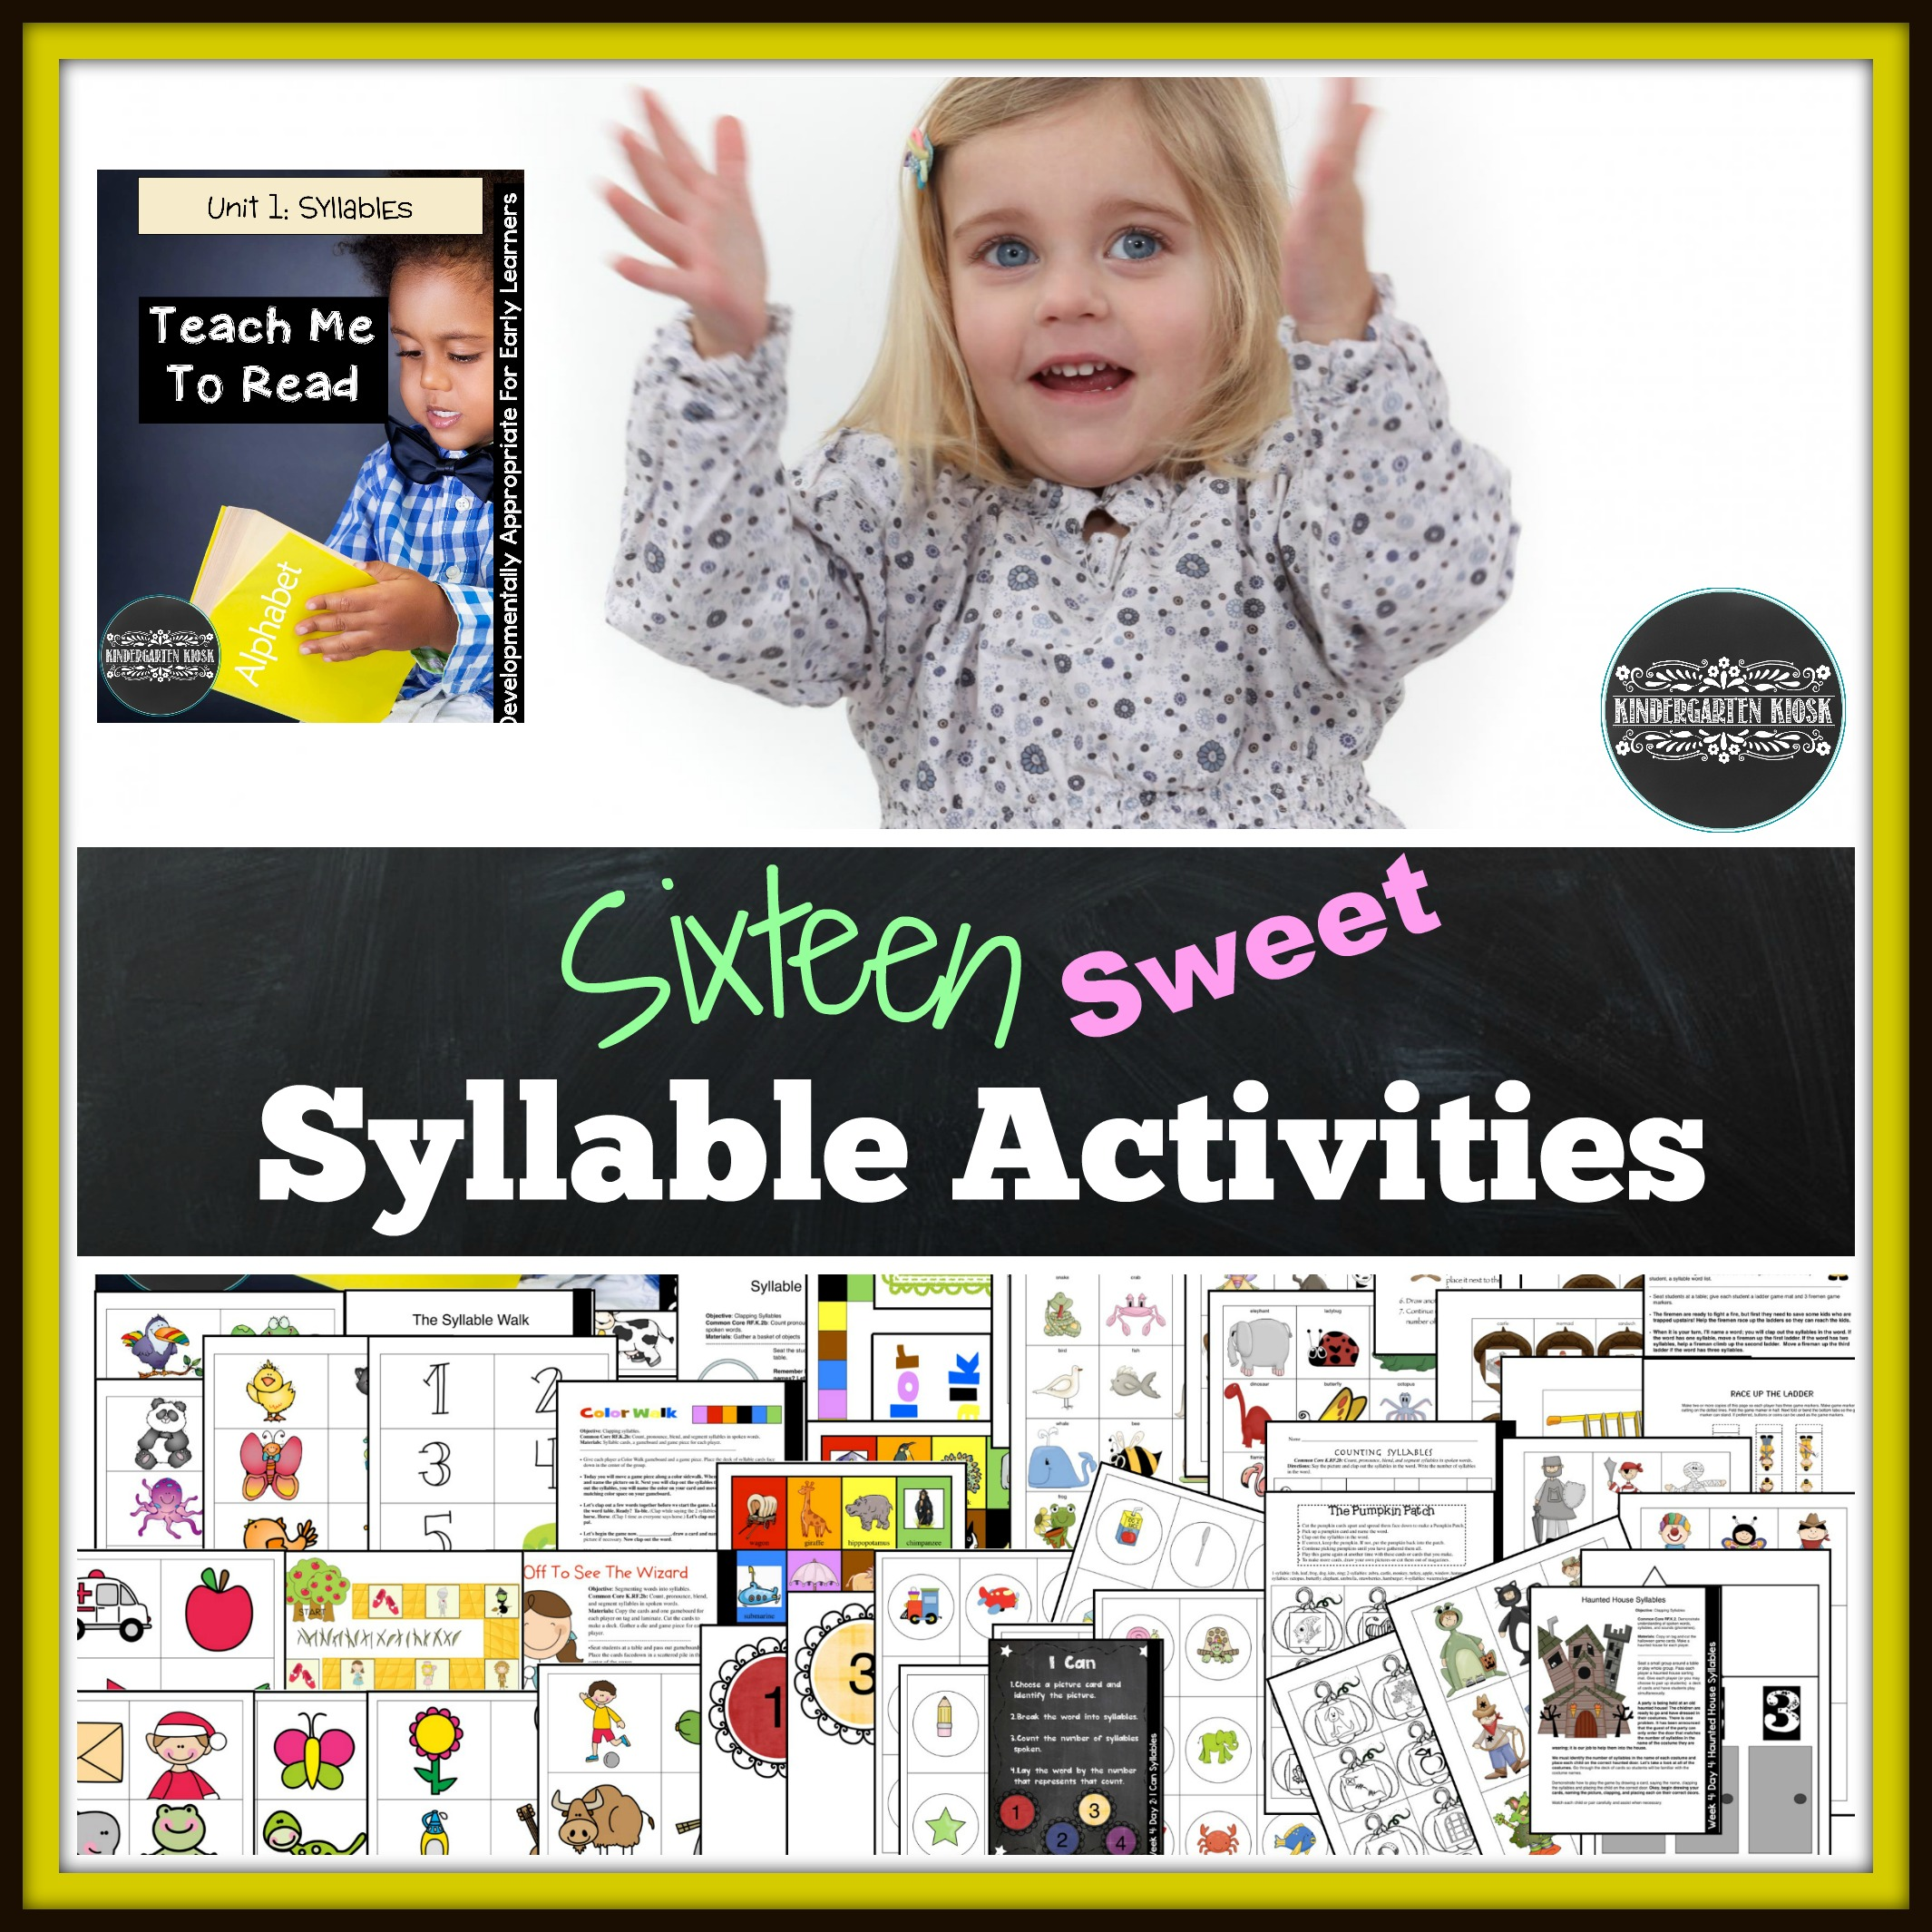 syllables.jpg